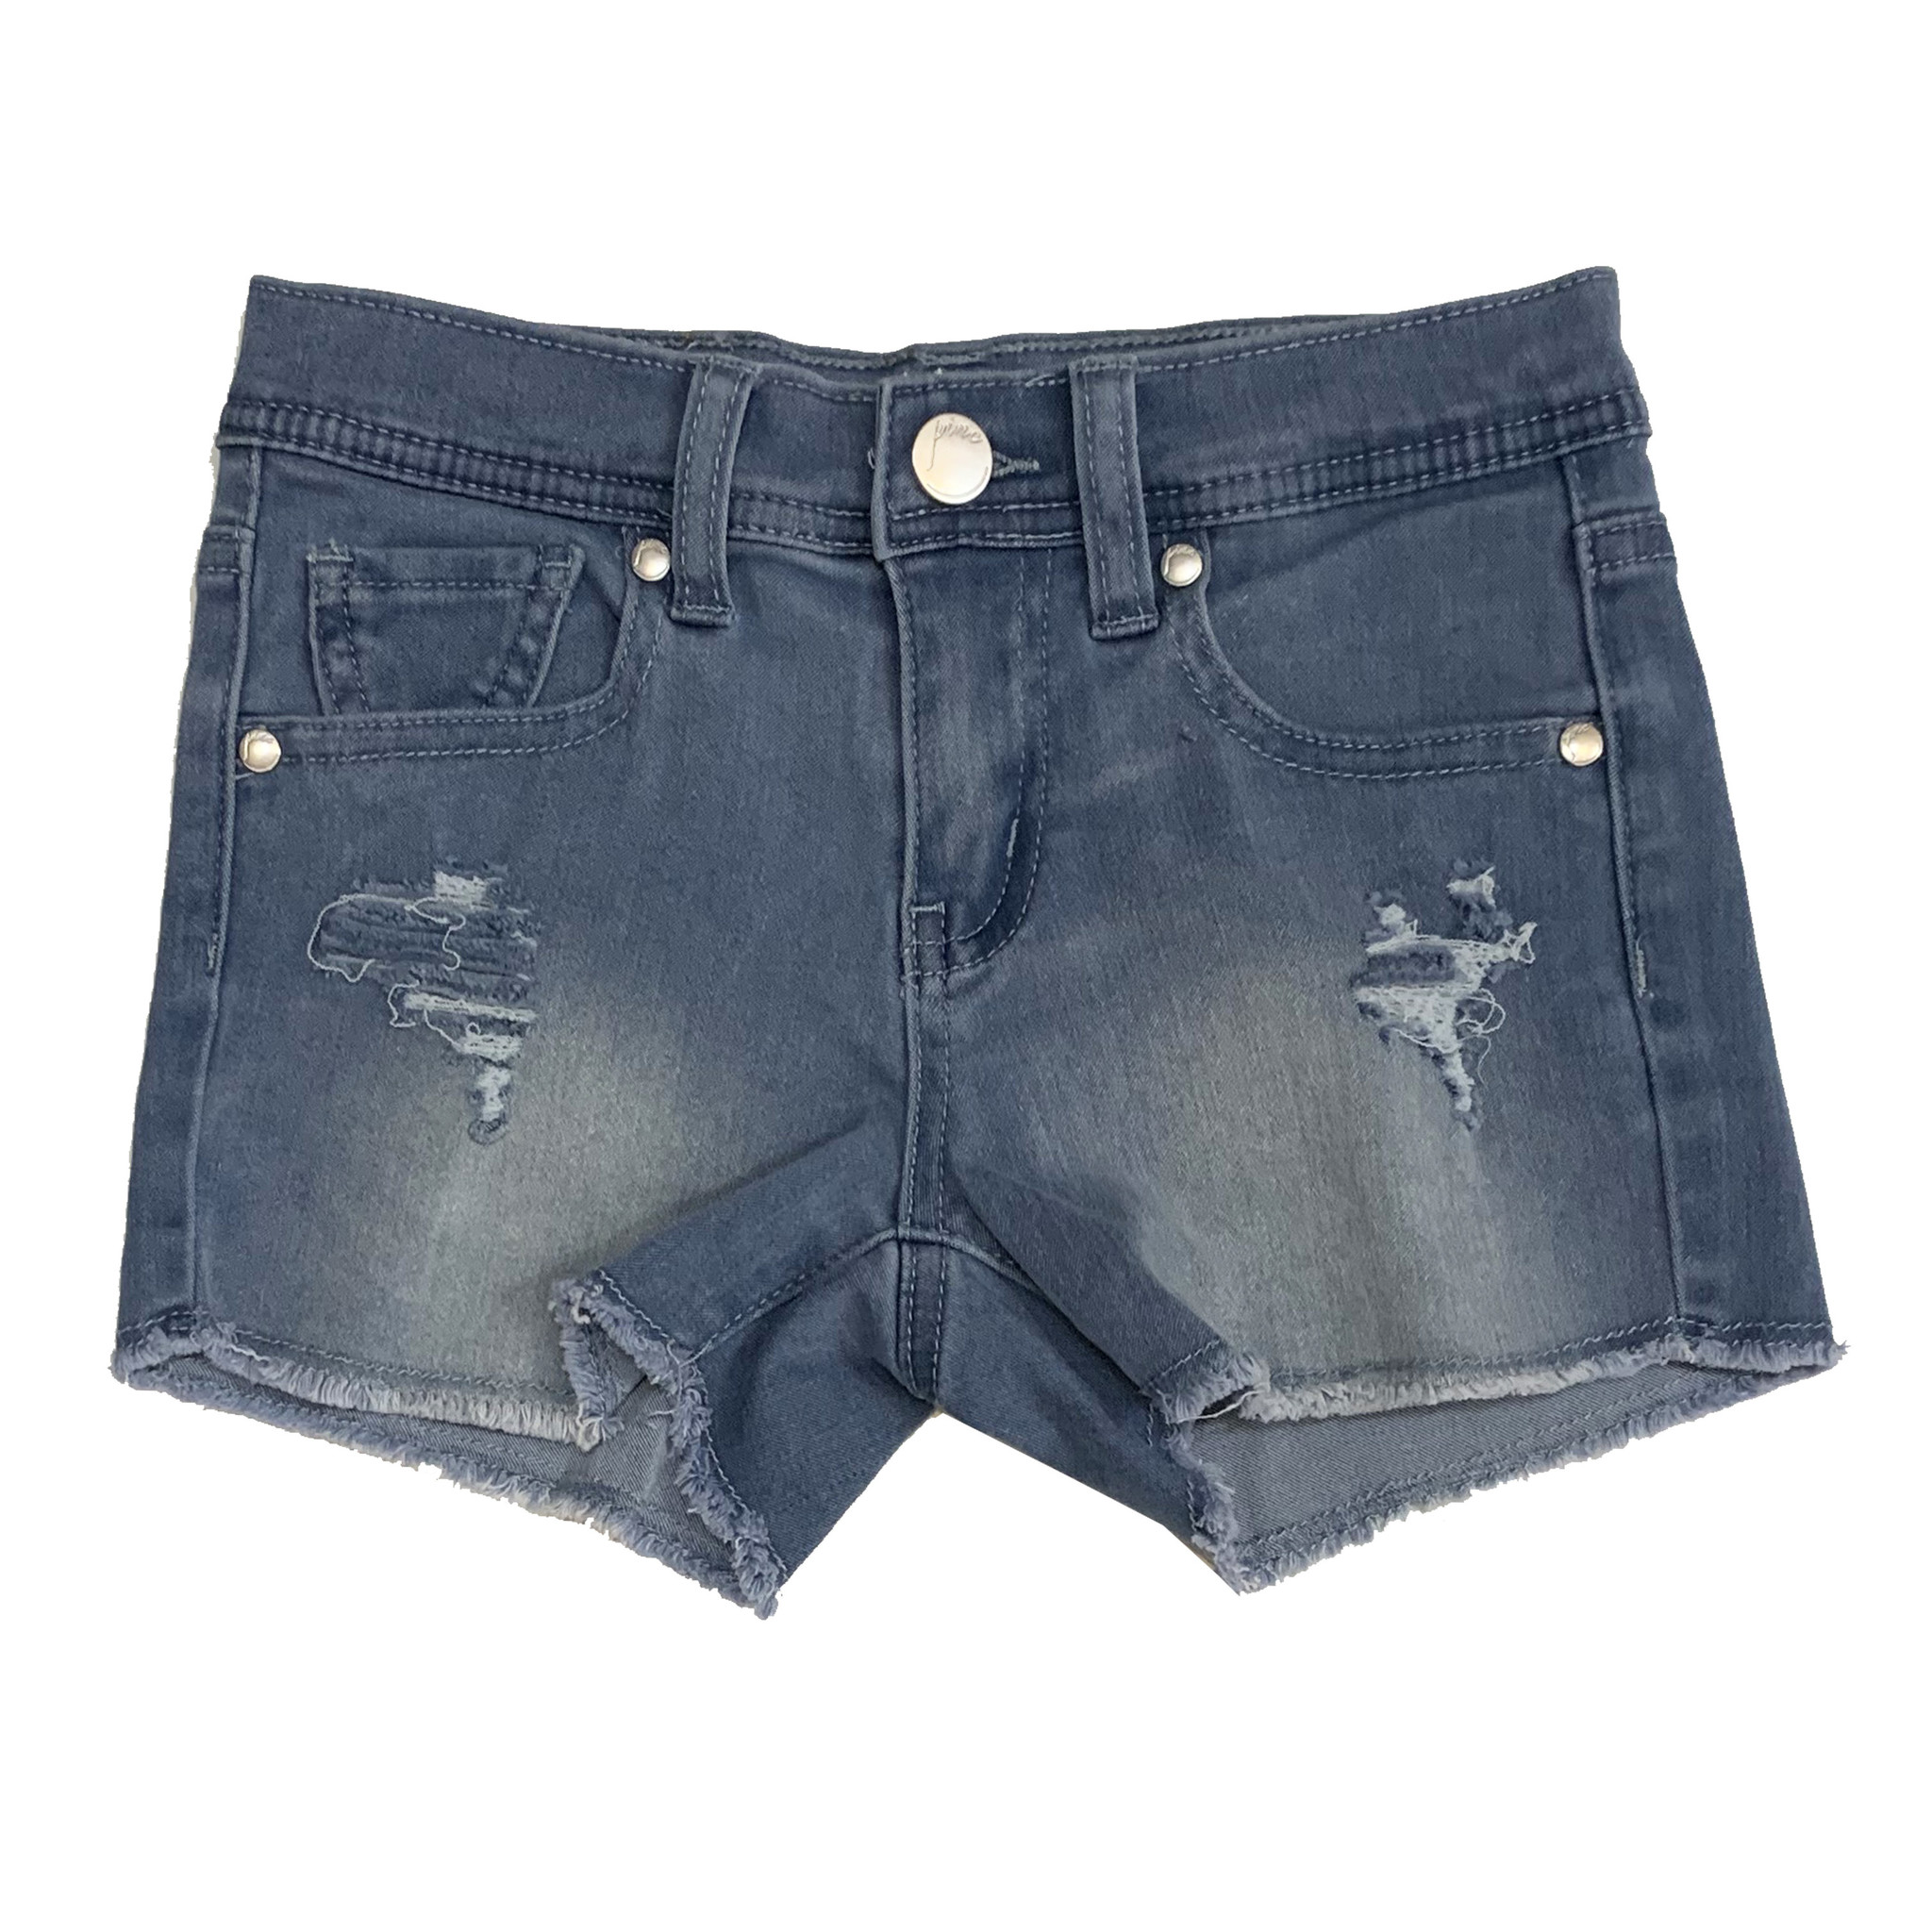 Pinc Light Wash Ripped Denim Shorts